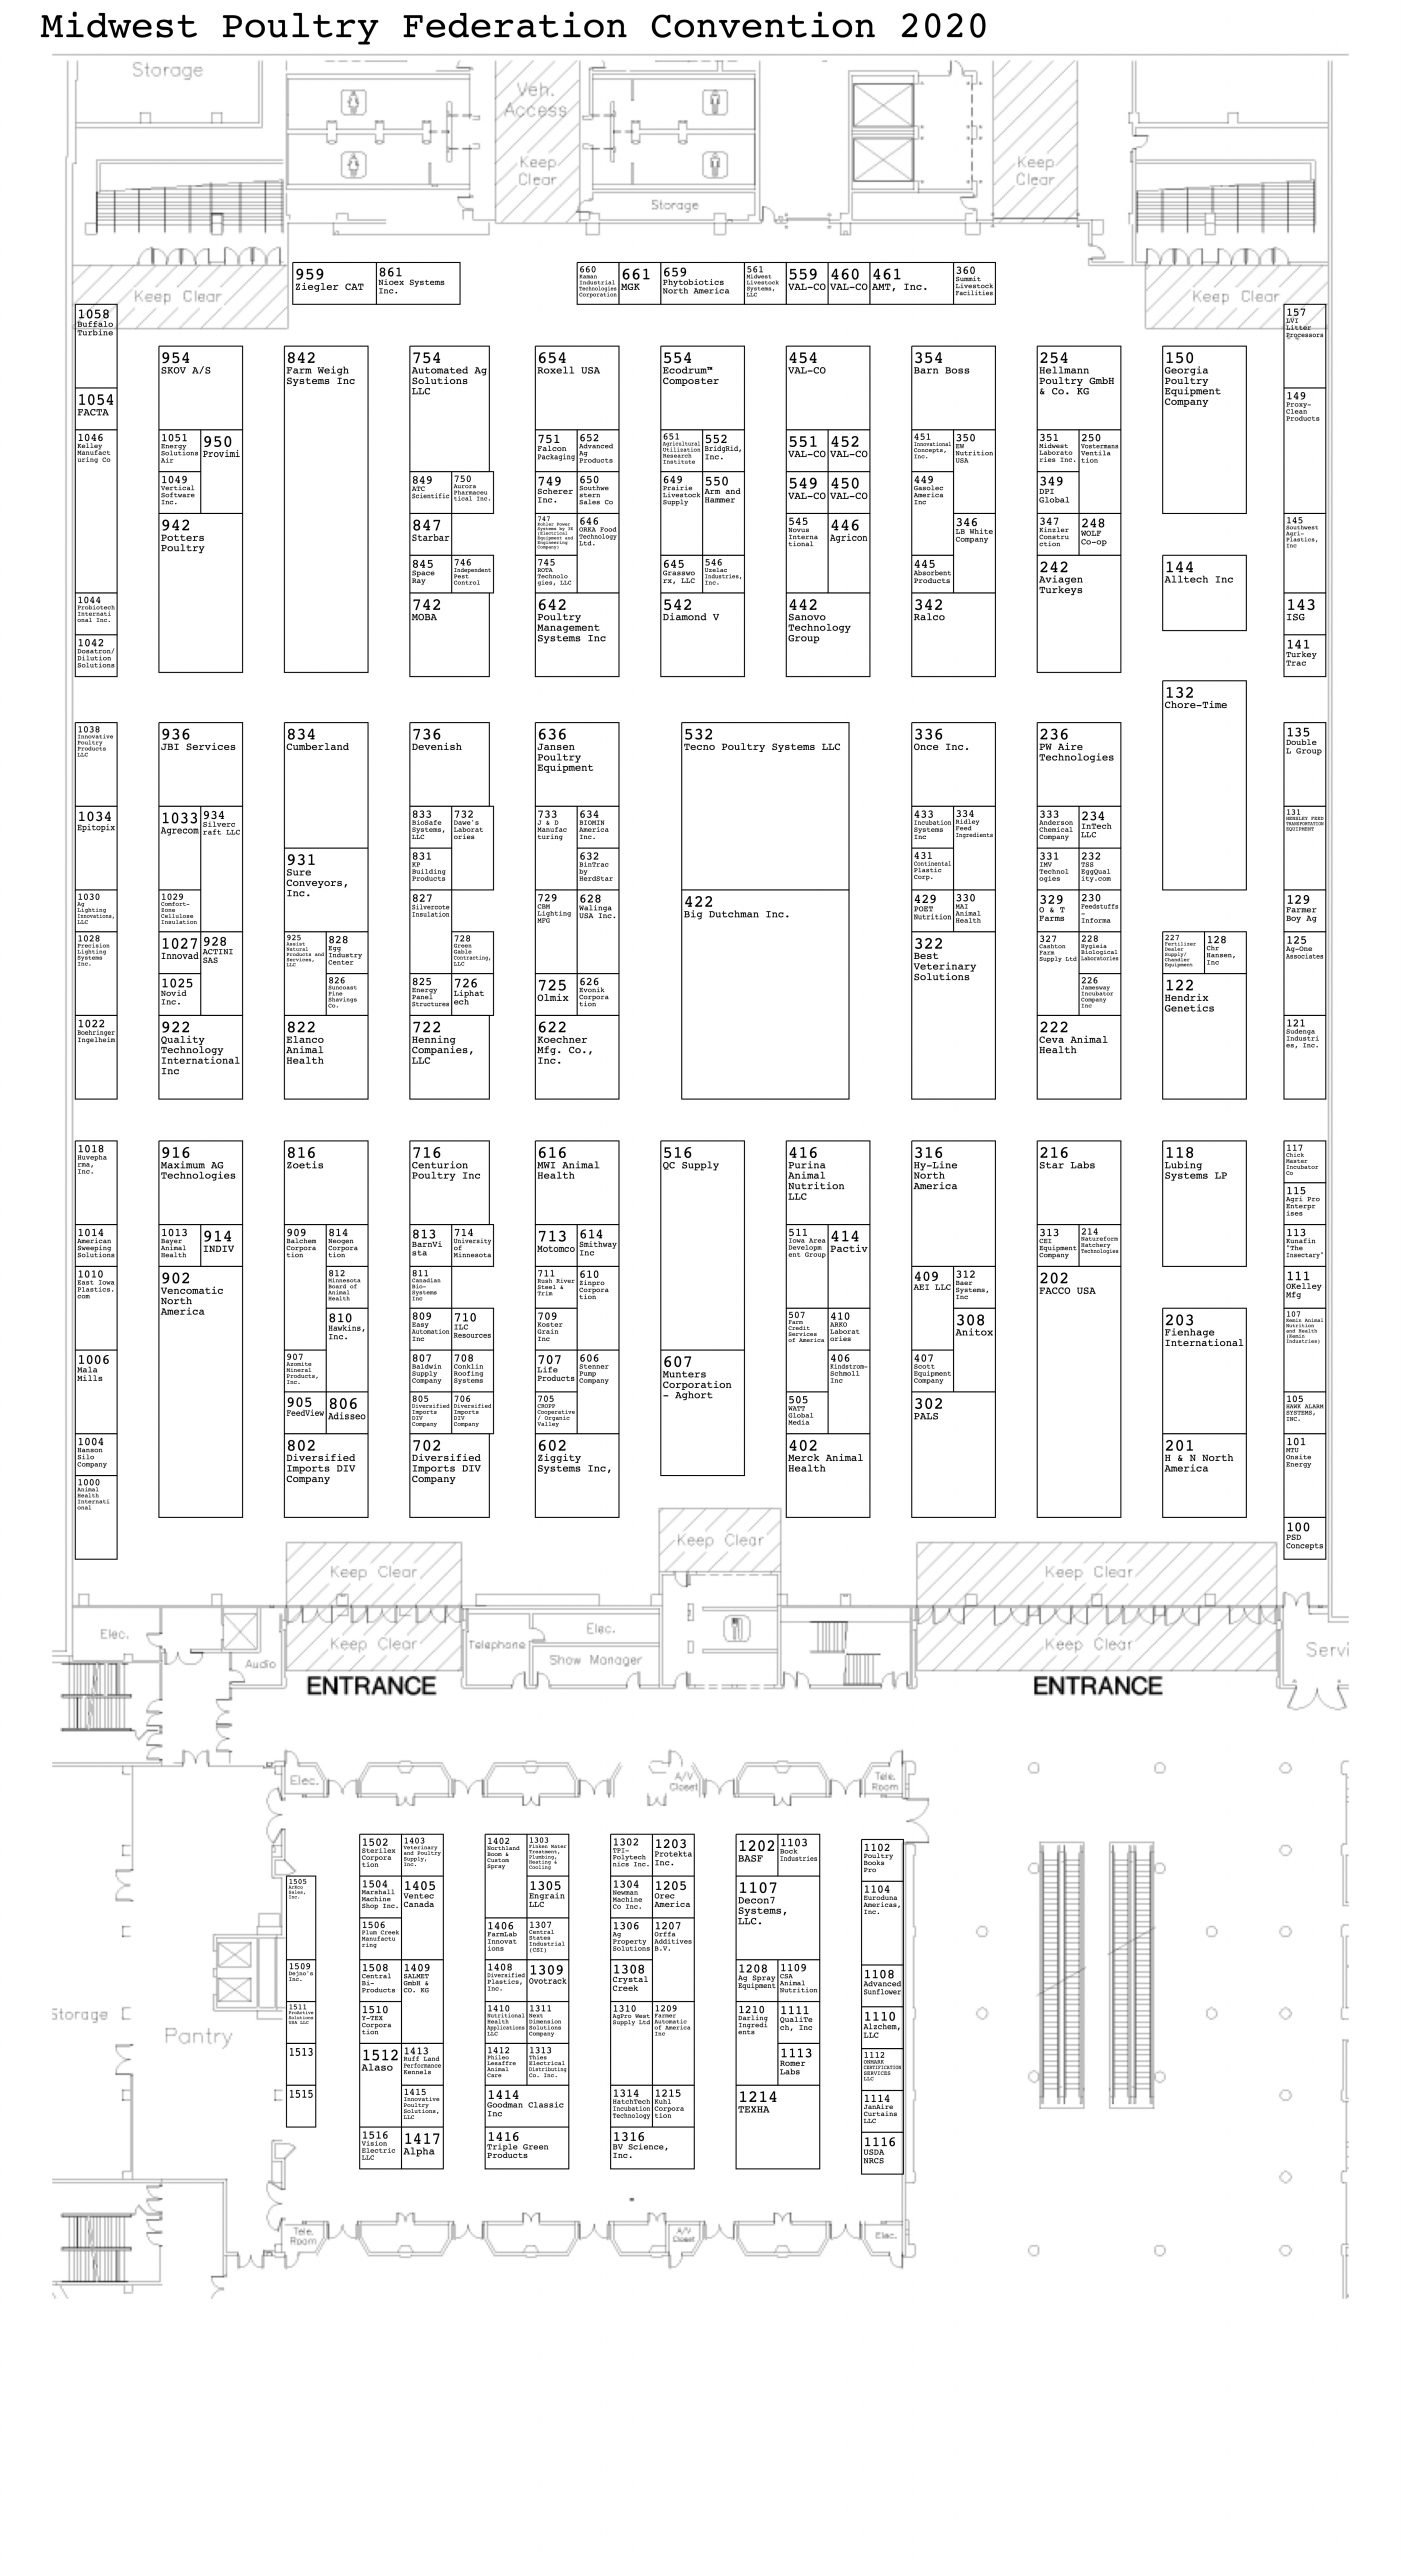 2020 MPF Convention Exhibit Floor Plan